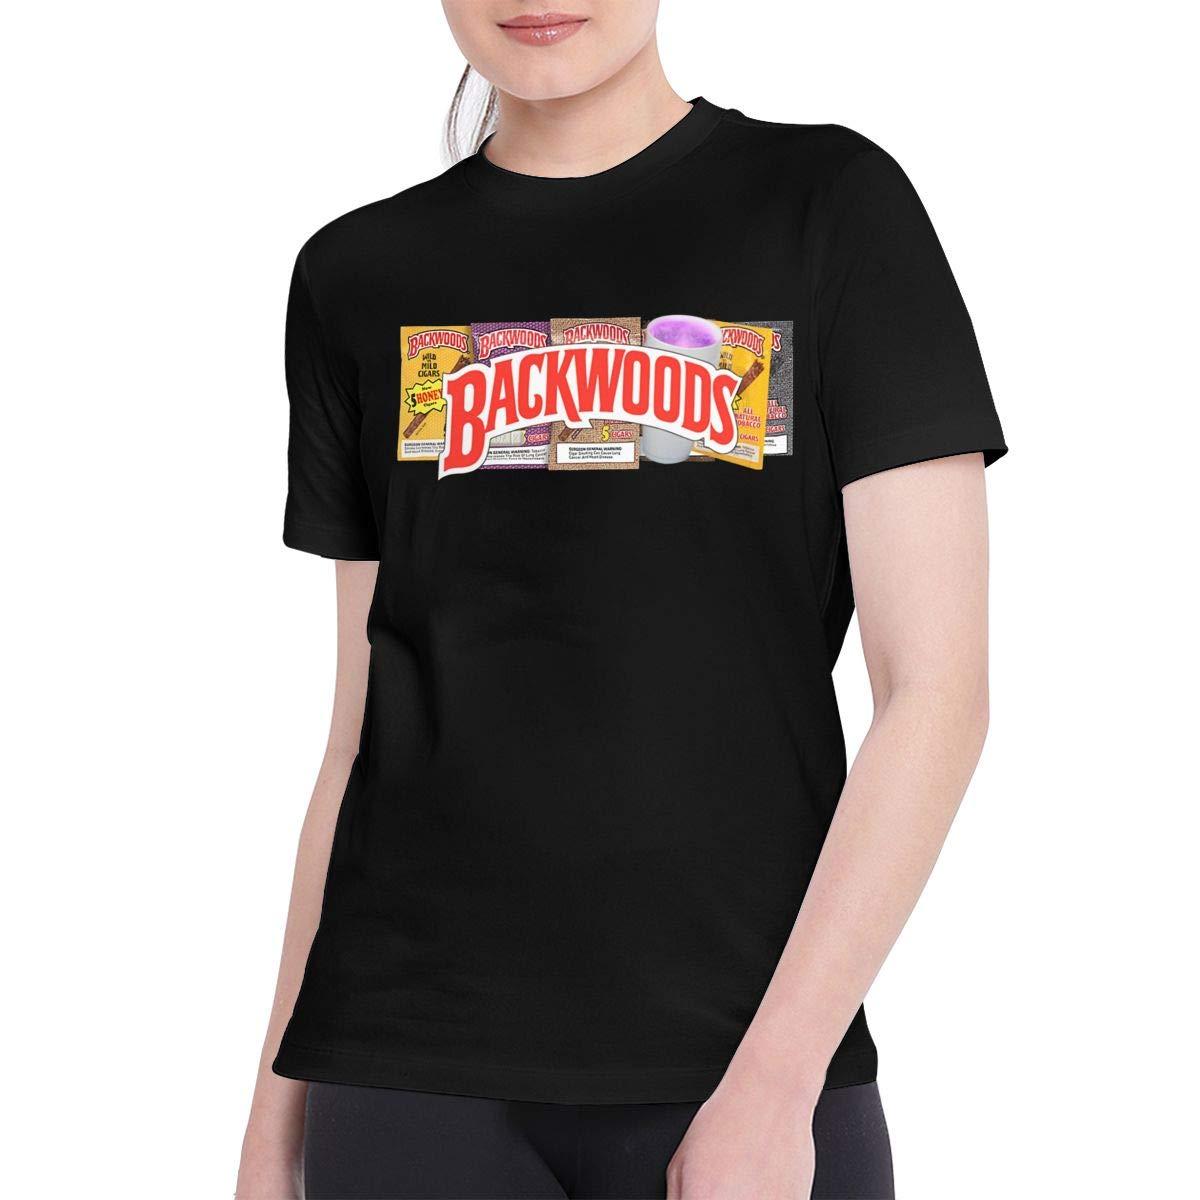 Samantha Naylor T Shirts For Fashion Backwoods Tee Black